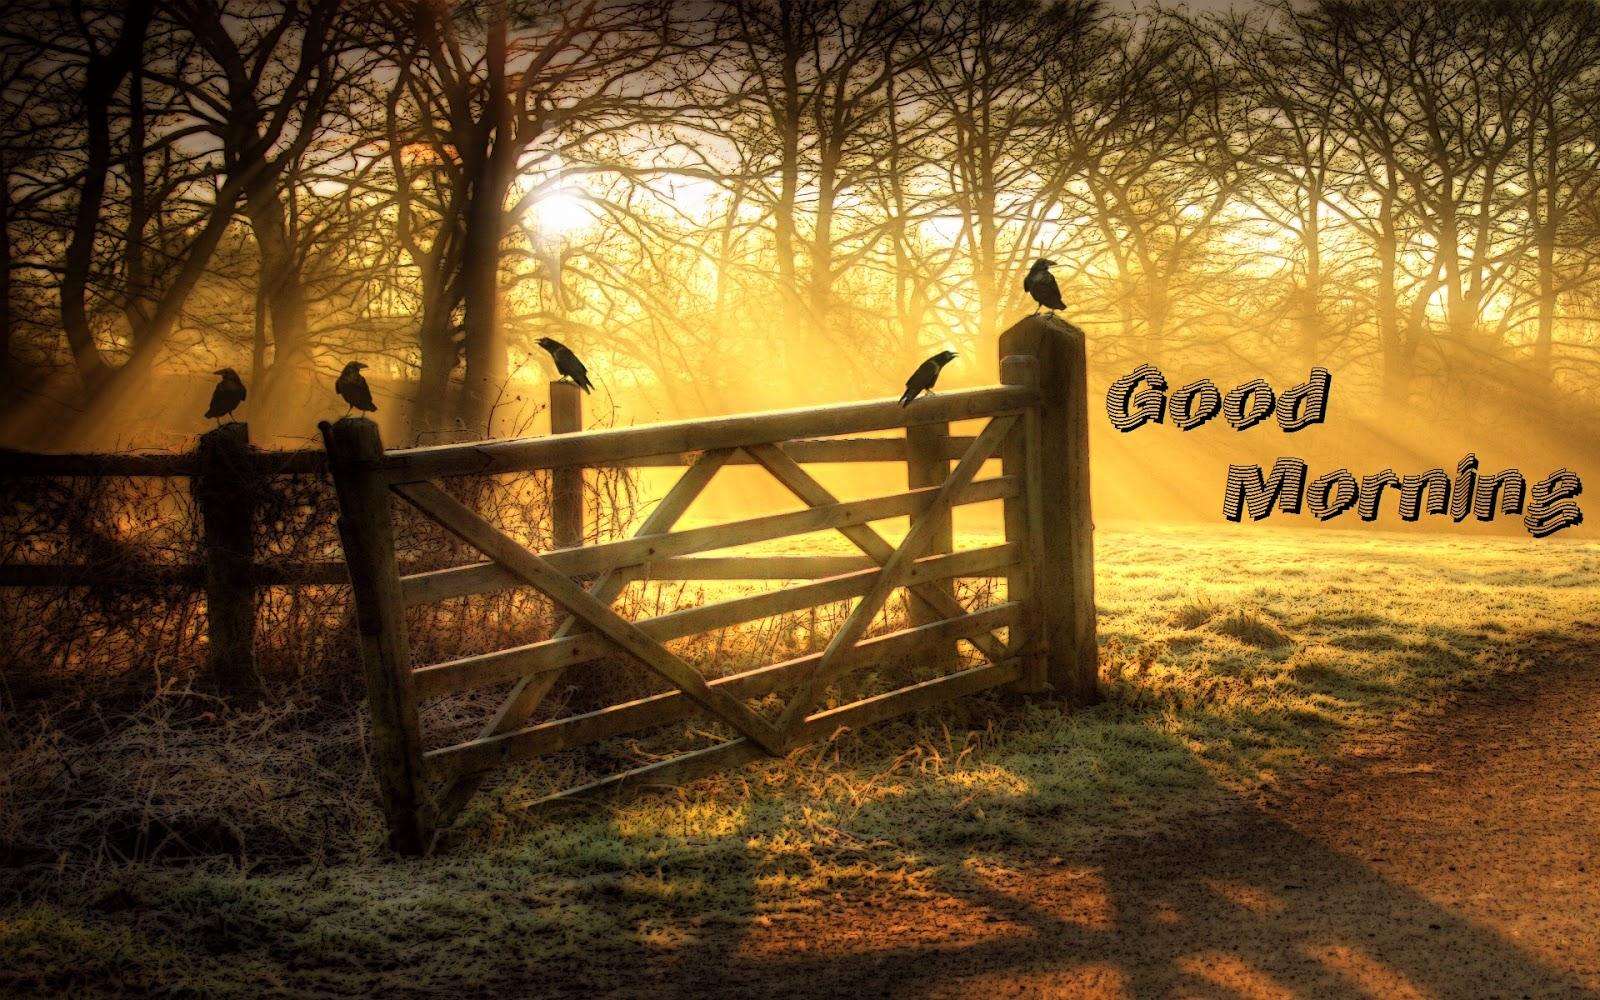 Hd Wallpaper Girl Cute Wonderful Good Morning Nature Cards Images Pics